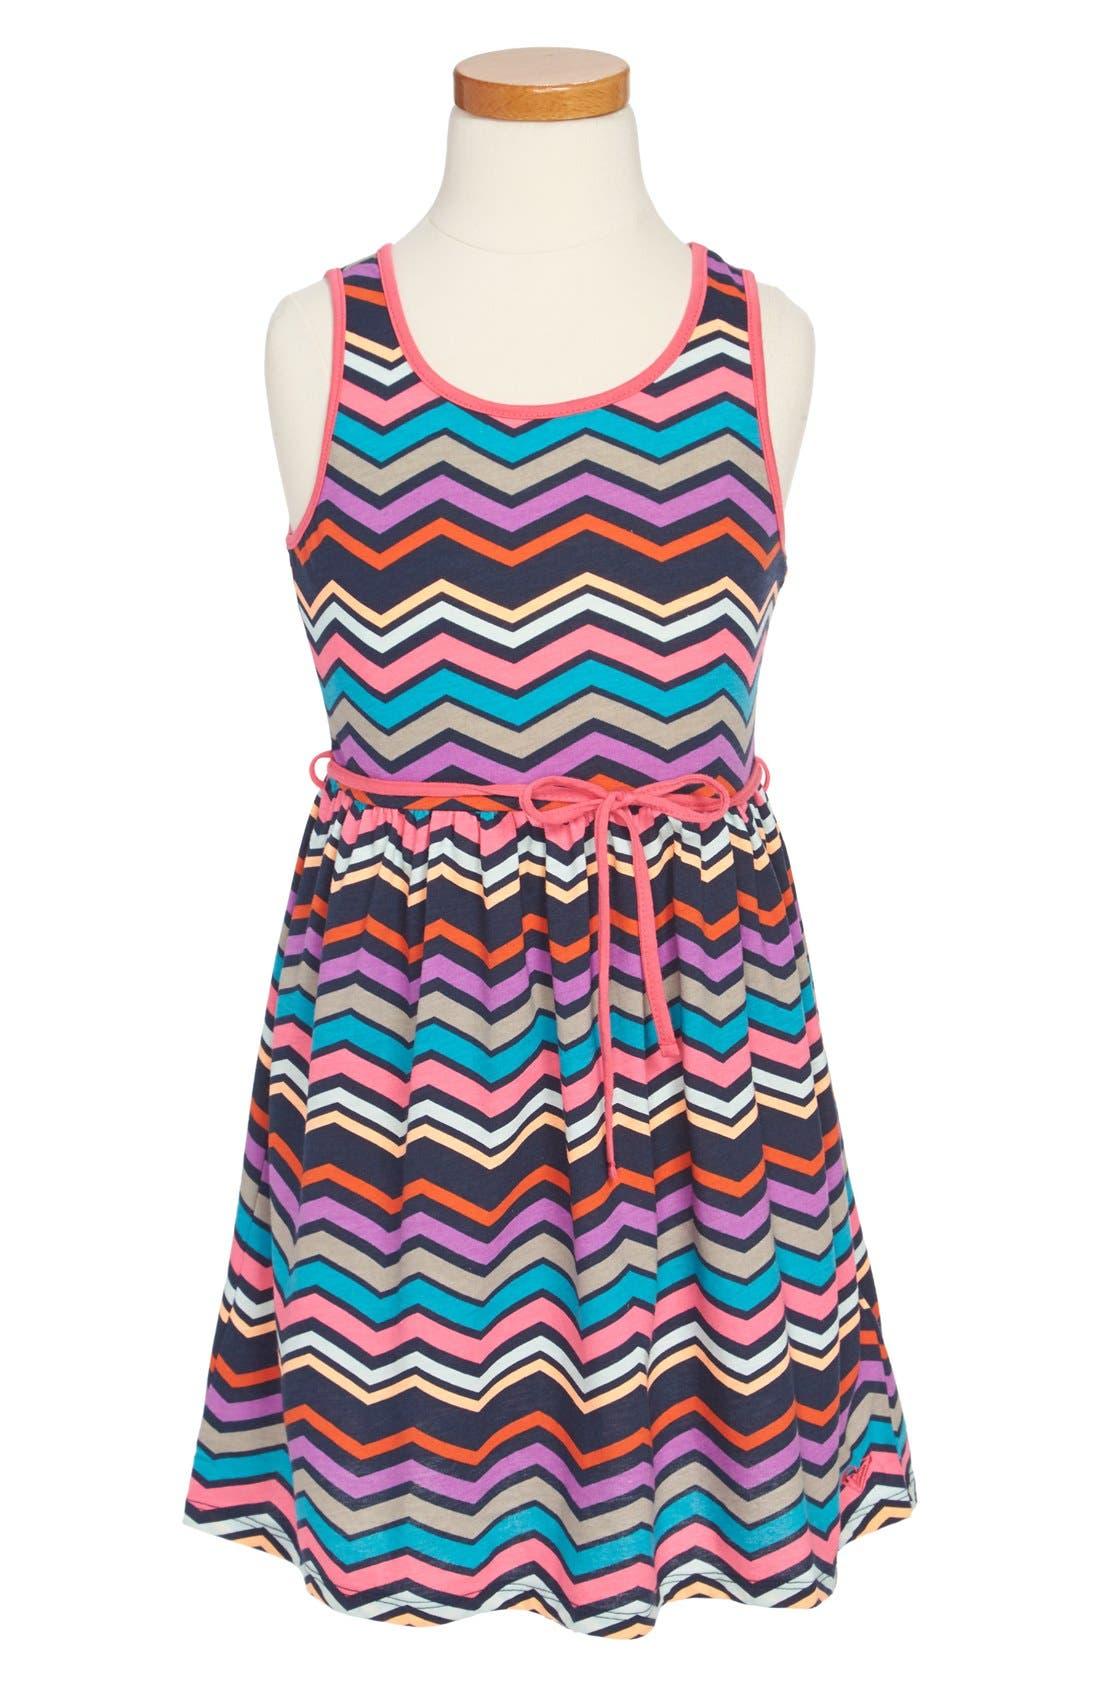 Main Image - Roxy 'Sweltering Heart' Tank Dress (Toddler Girls)